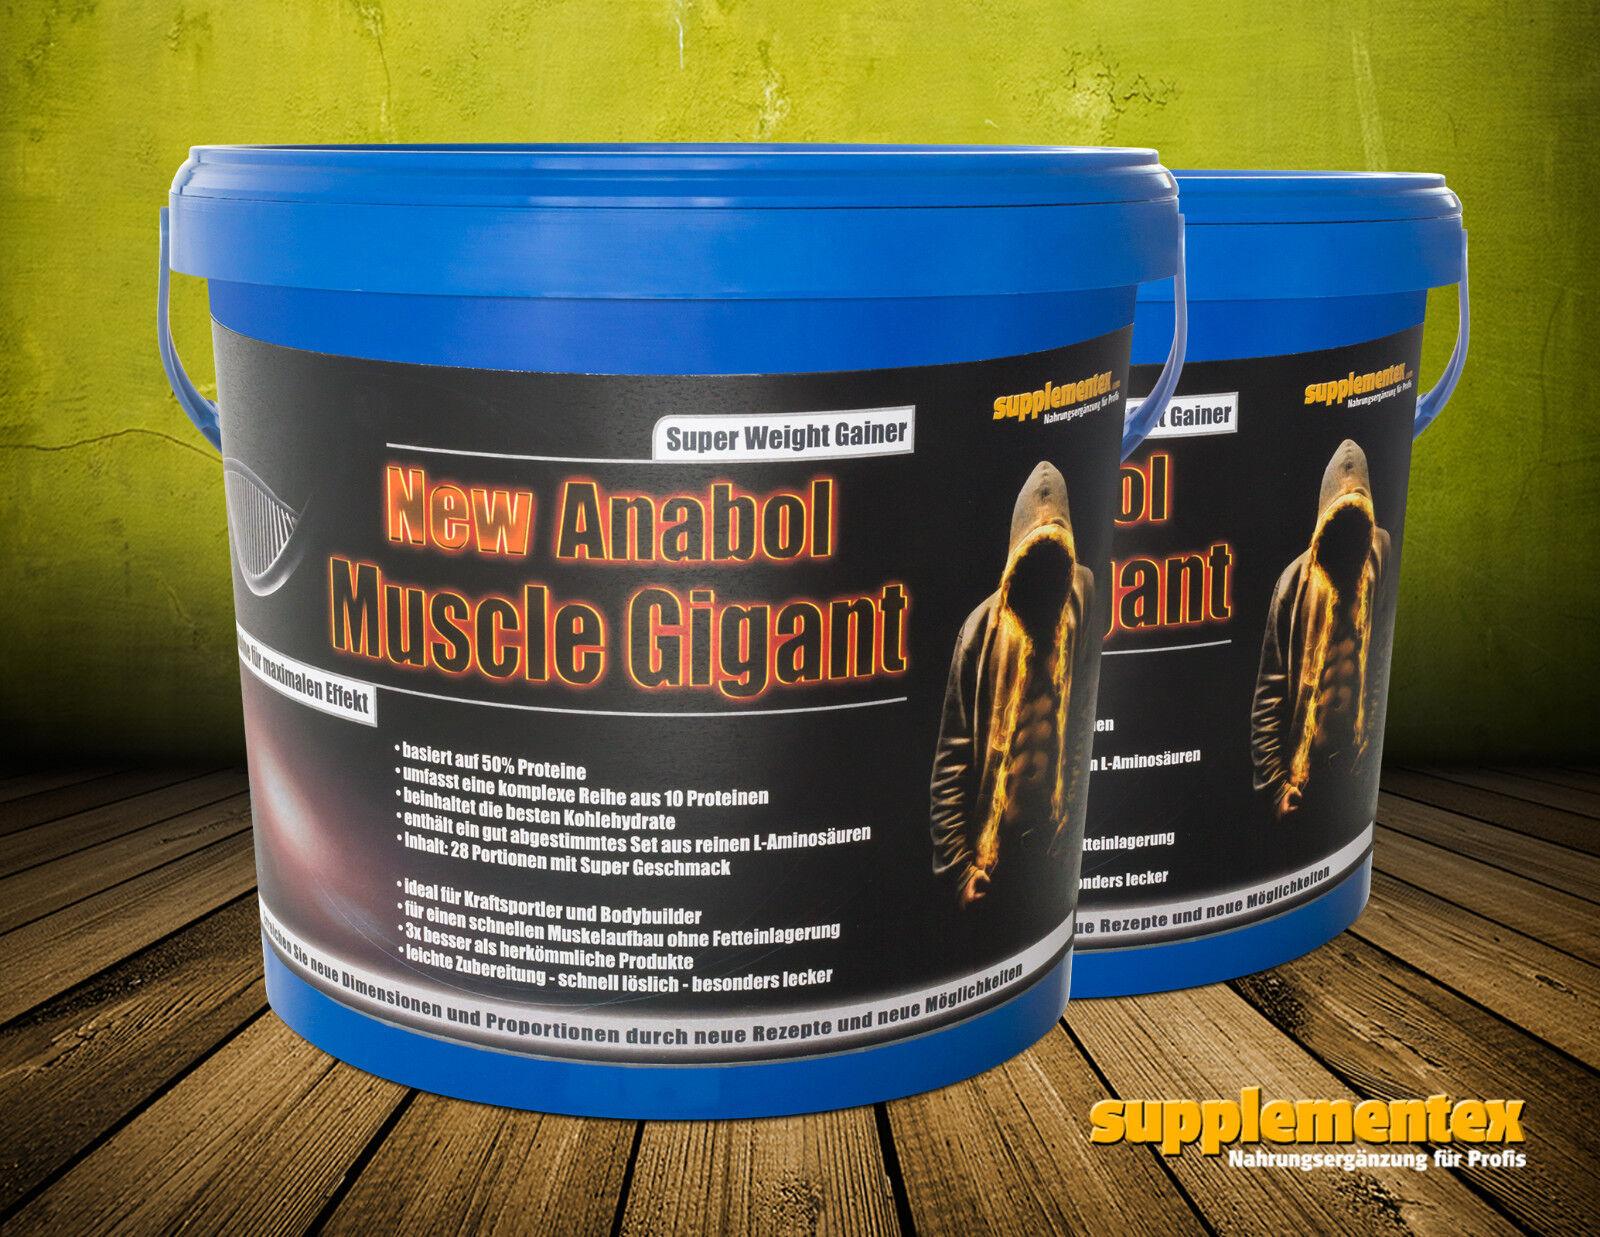 2x2,27kg New Eiweiss Anabol Muscle Gigant  Eiweiss New Anabol Muskelaufbau BCAA Gainer Masse 87eaf1